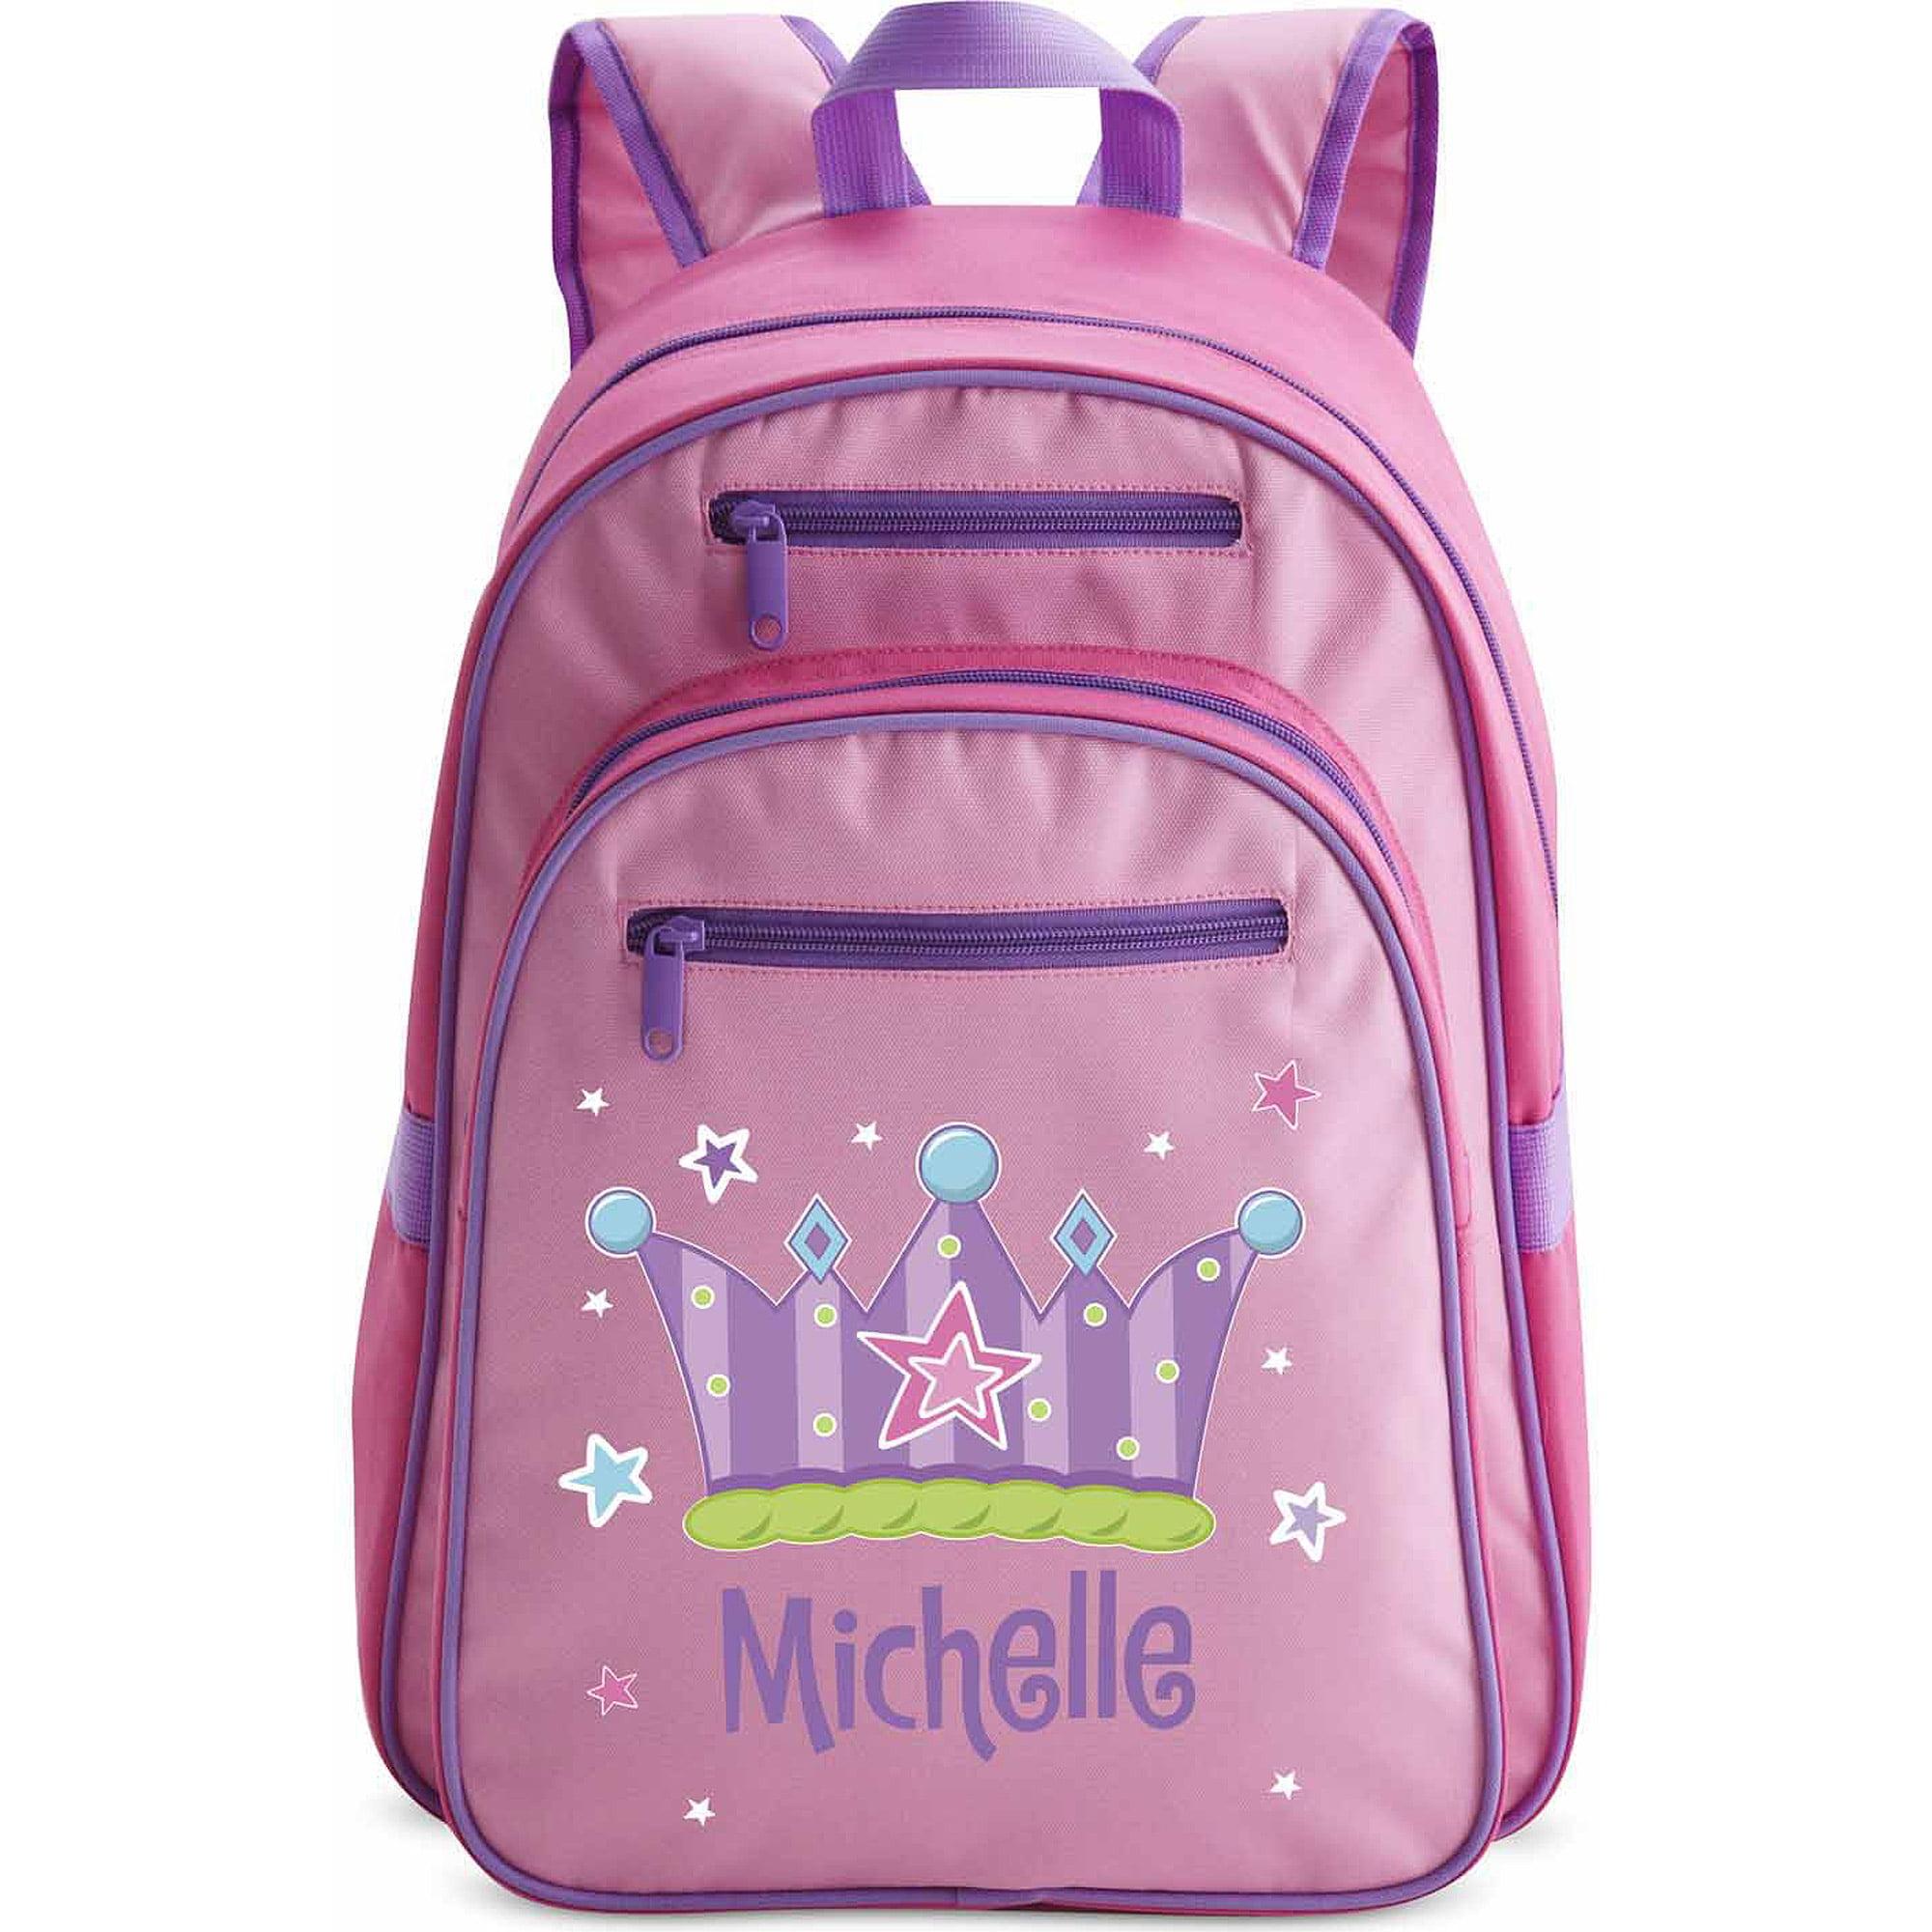 Personalized Princess Backpack - Walmart.com